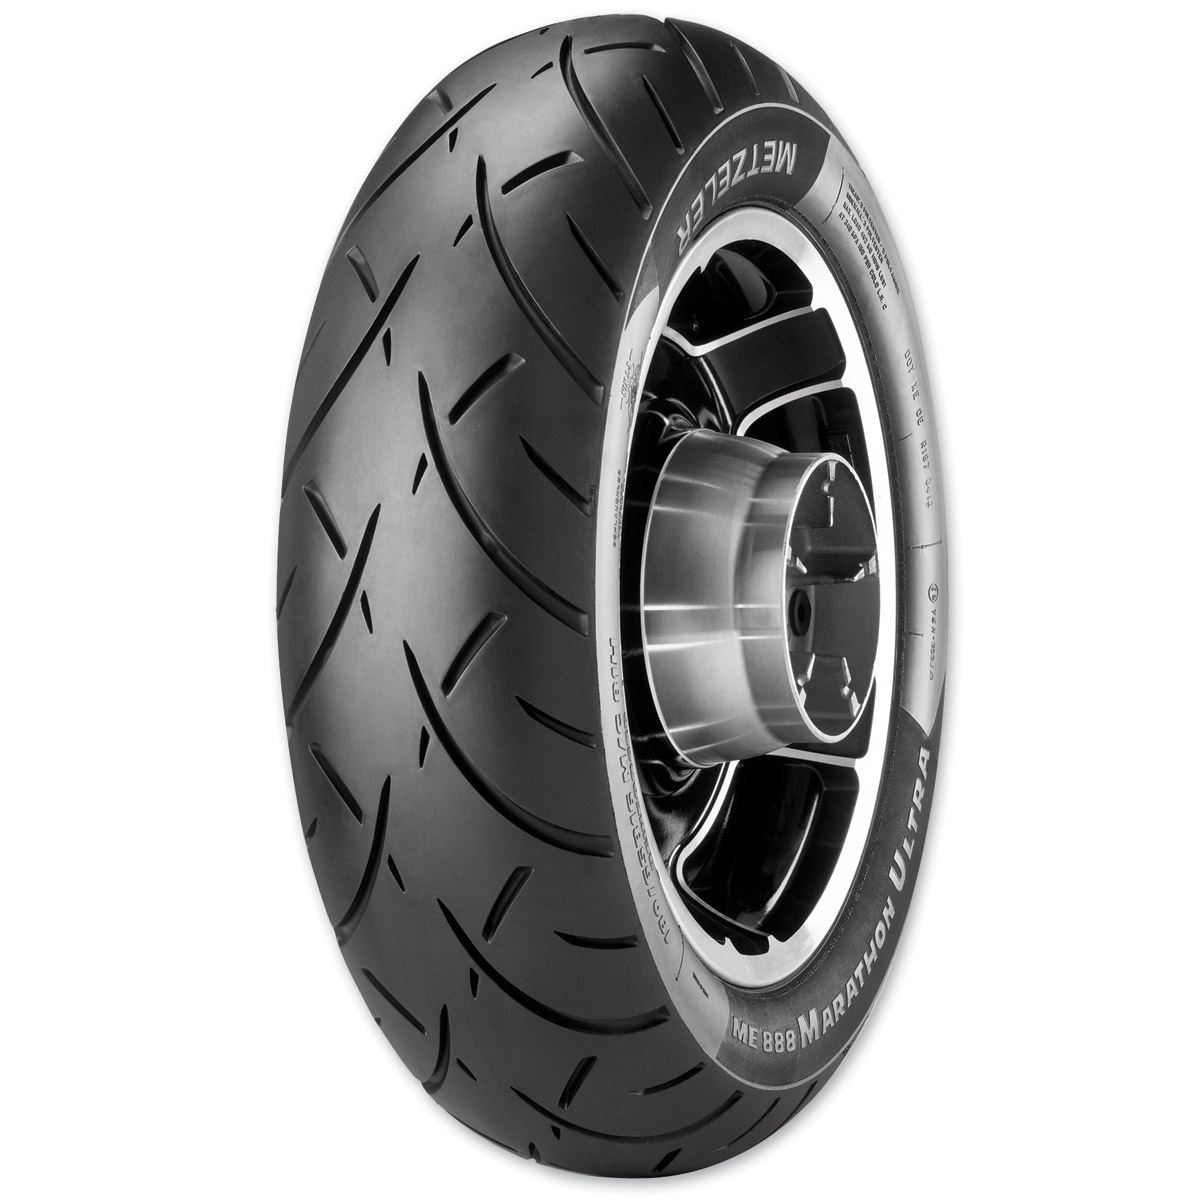 Metzeler ME888 Marathon Ultra MT90B16 Rear Tire